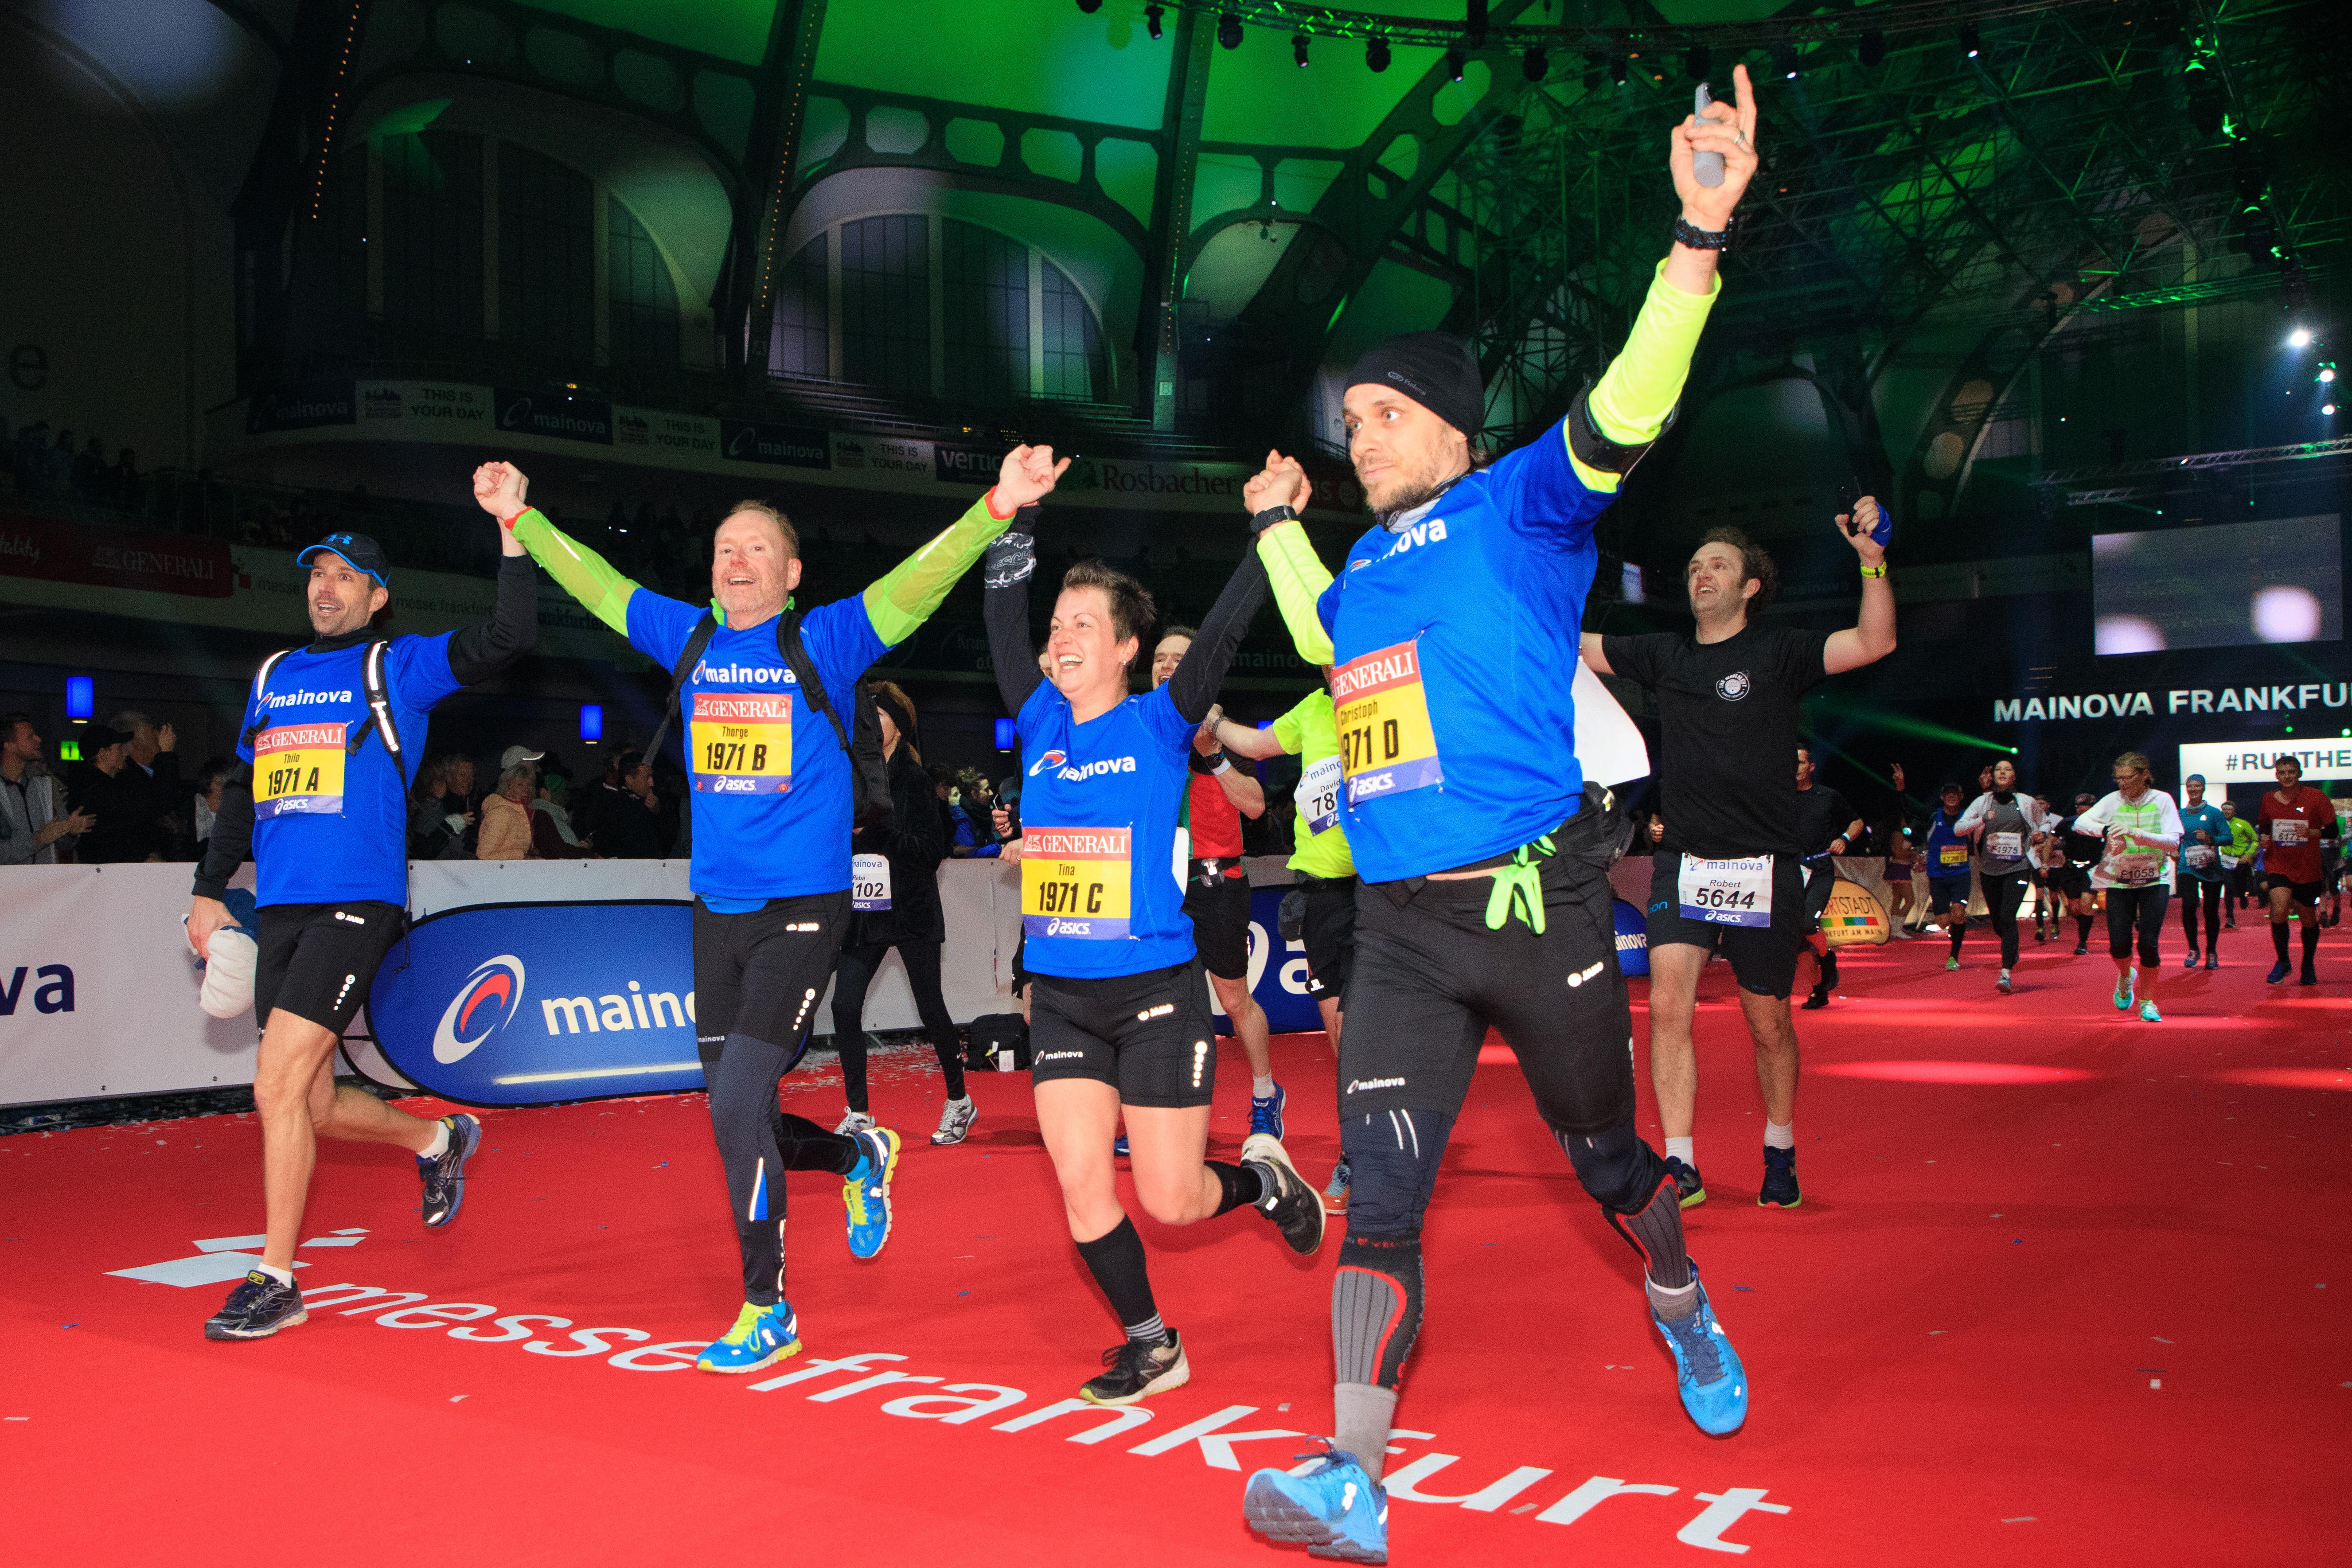 Frankfurt Staffelmarathon